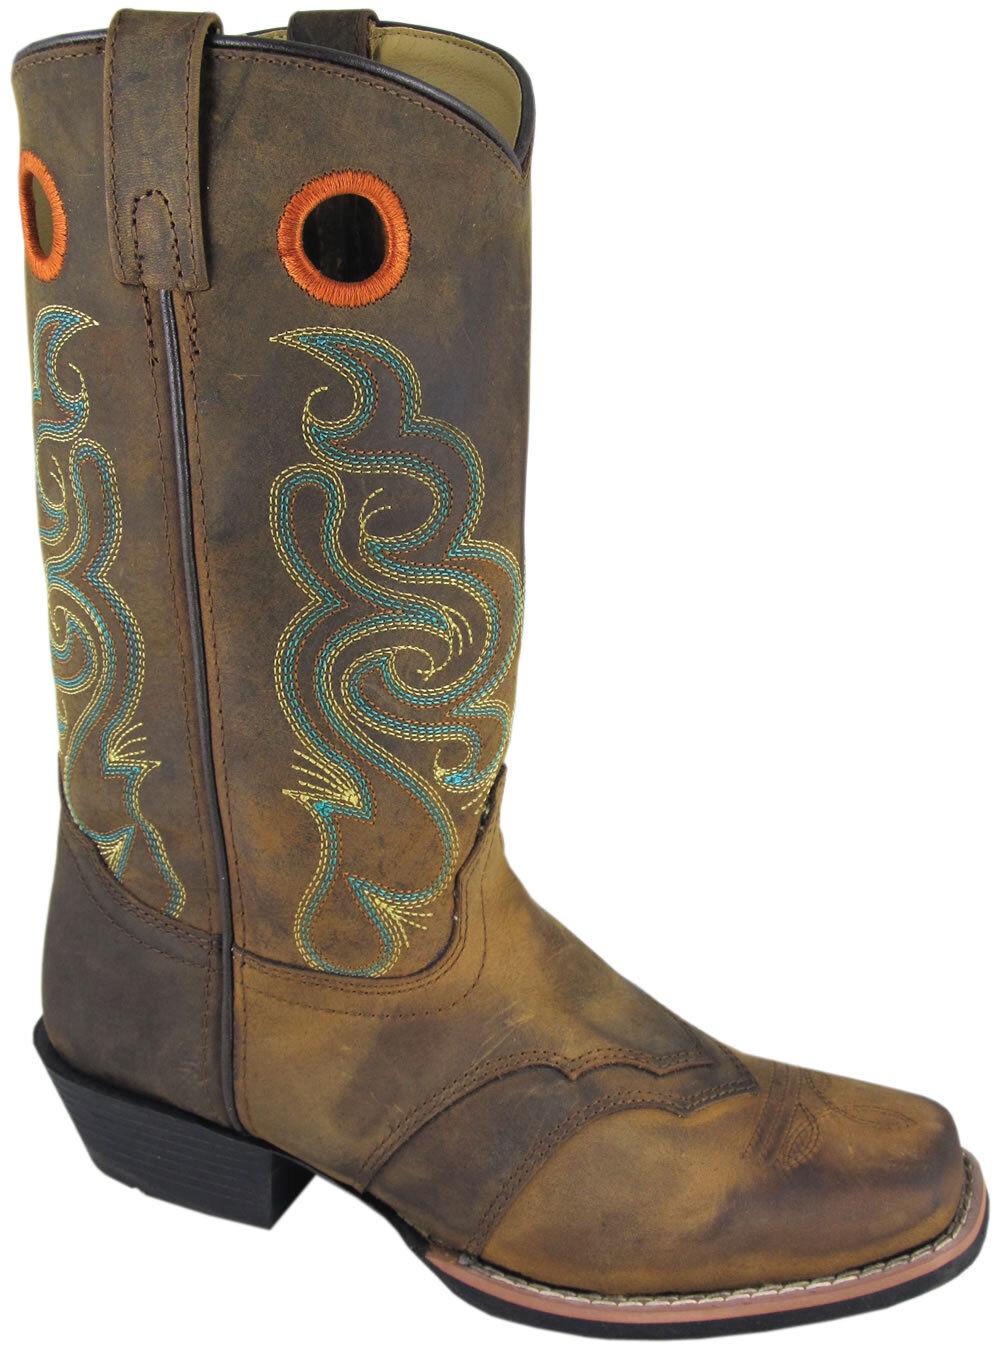 Smoky Mountain Ladies Marronee Leather Square Toe Cowboy stivali Dimensione 6 SALE